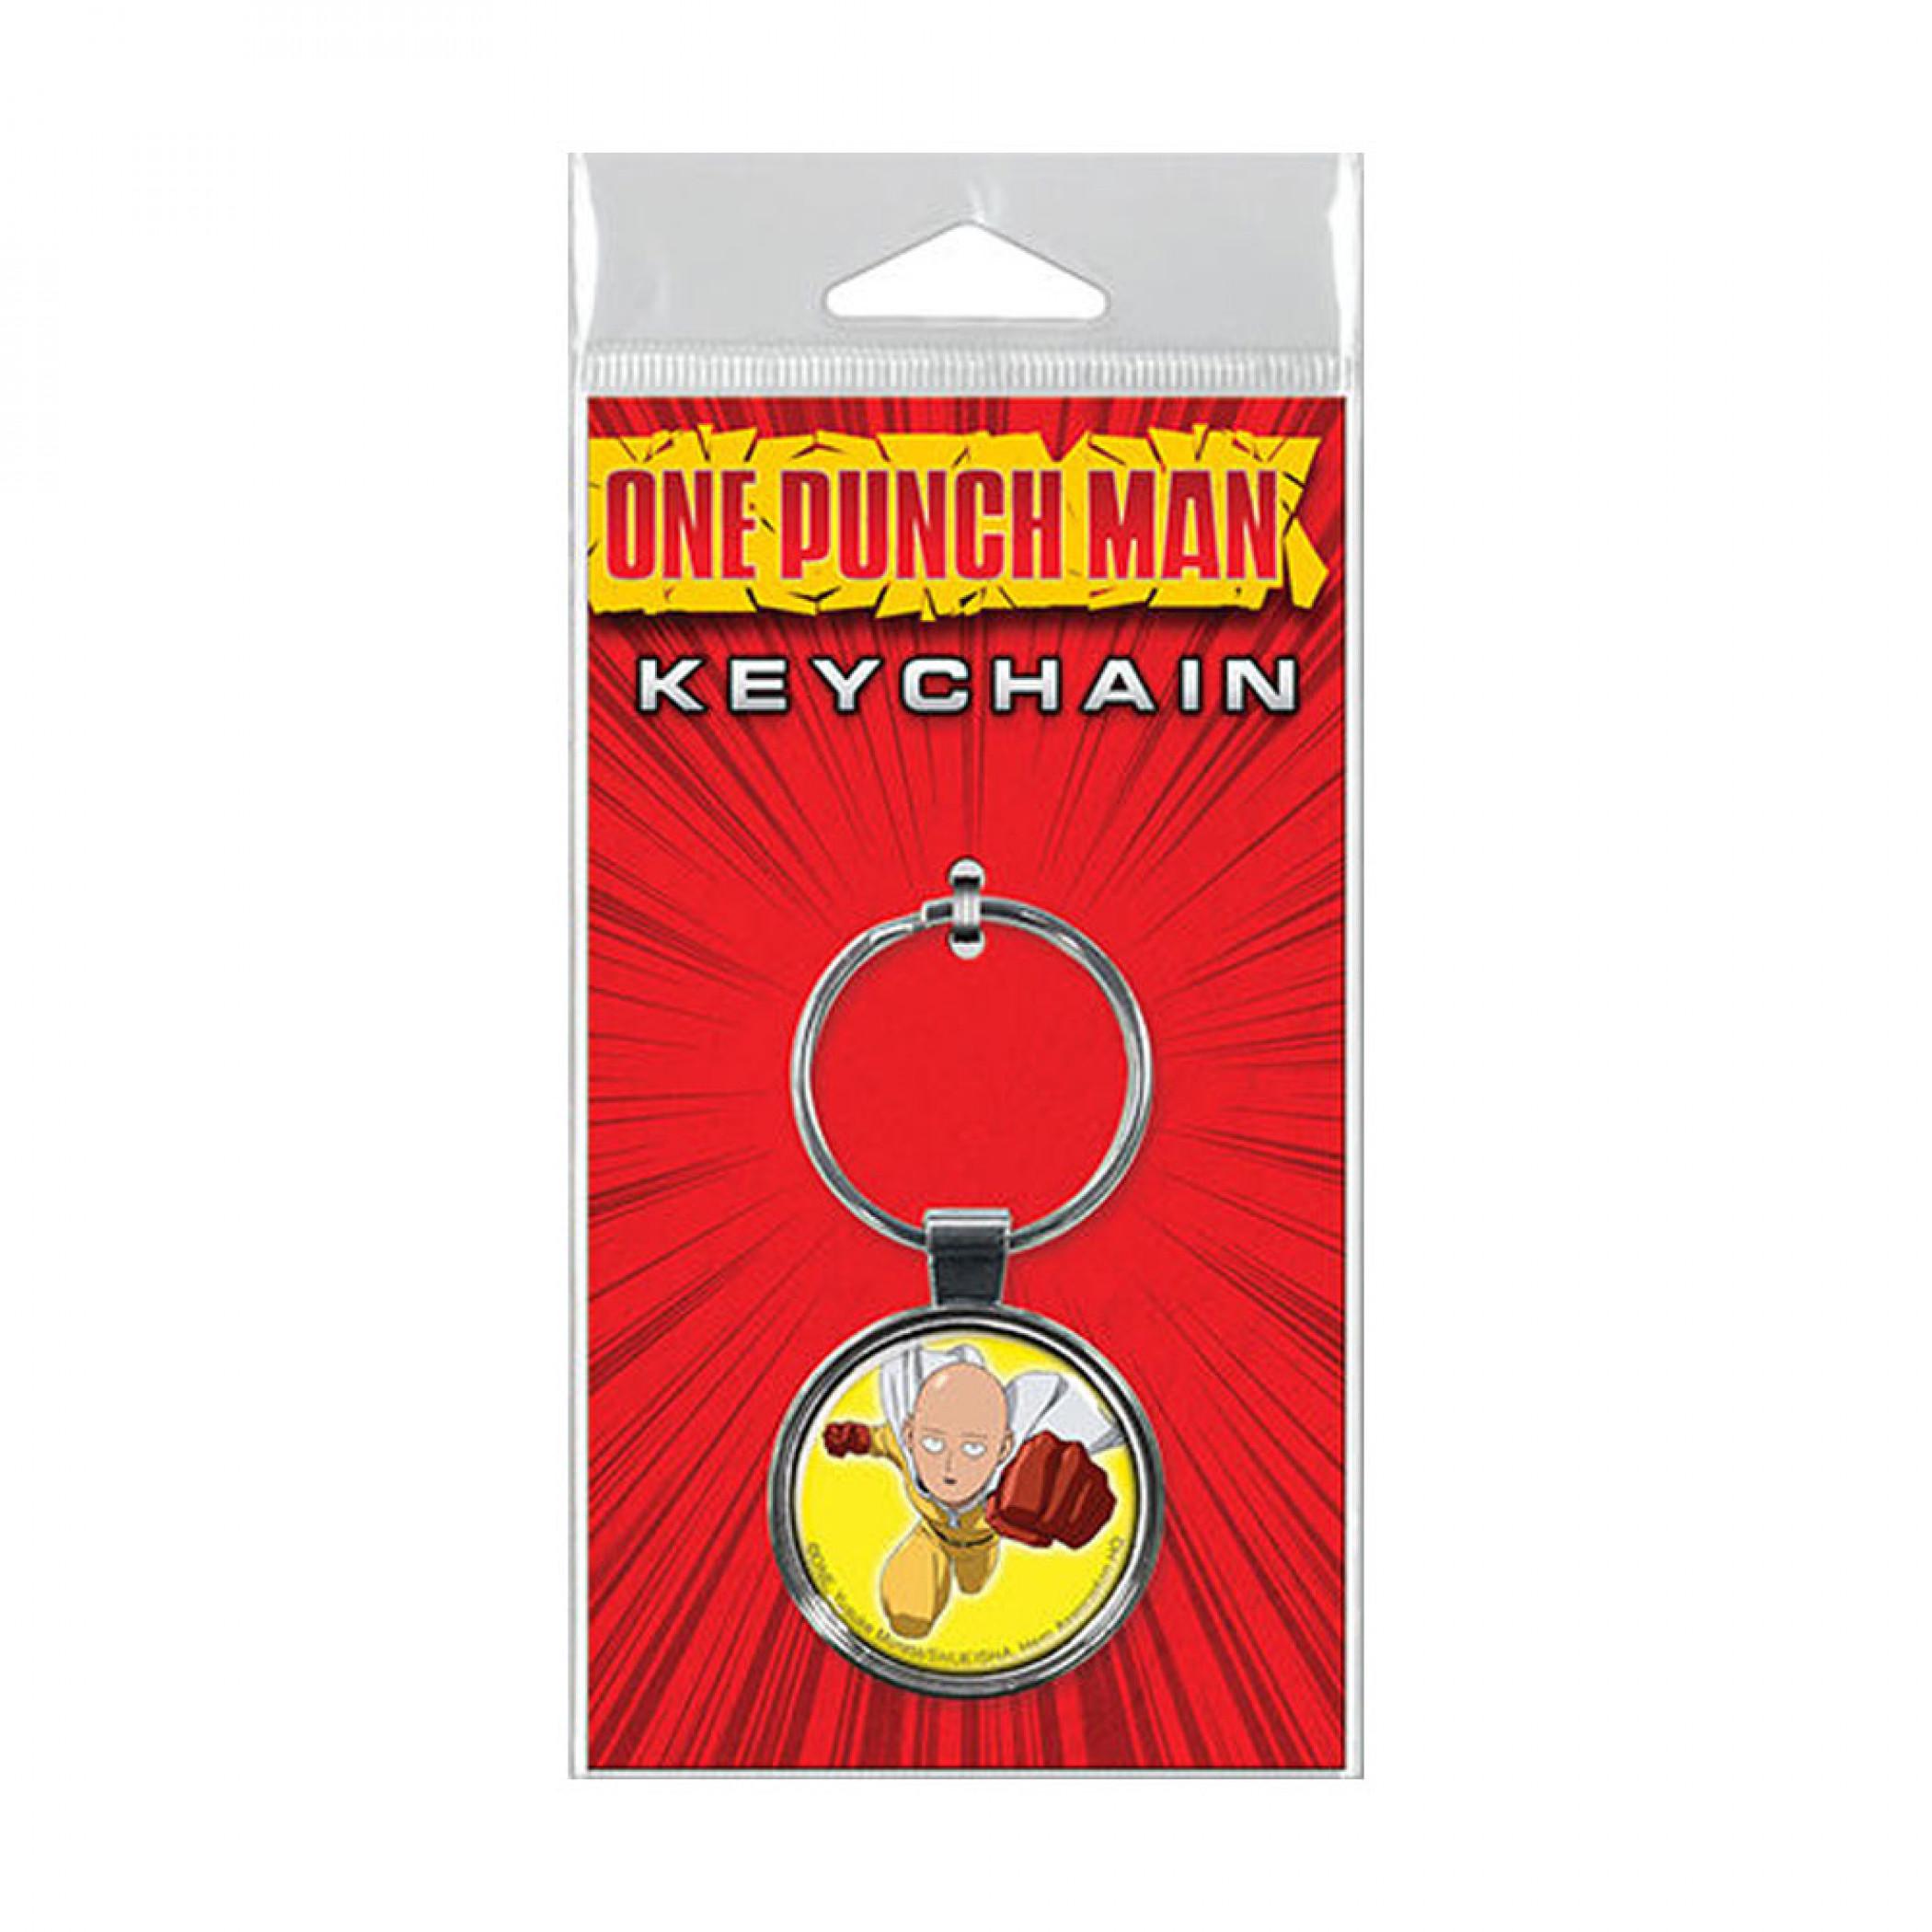 One Punch Man Keychain